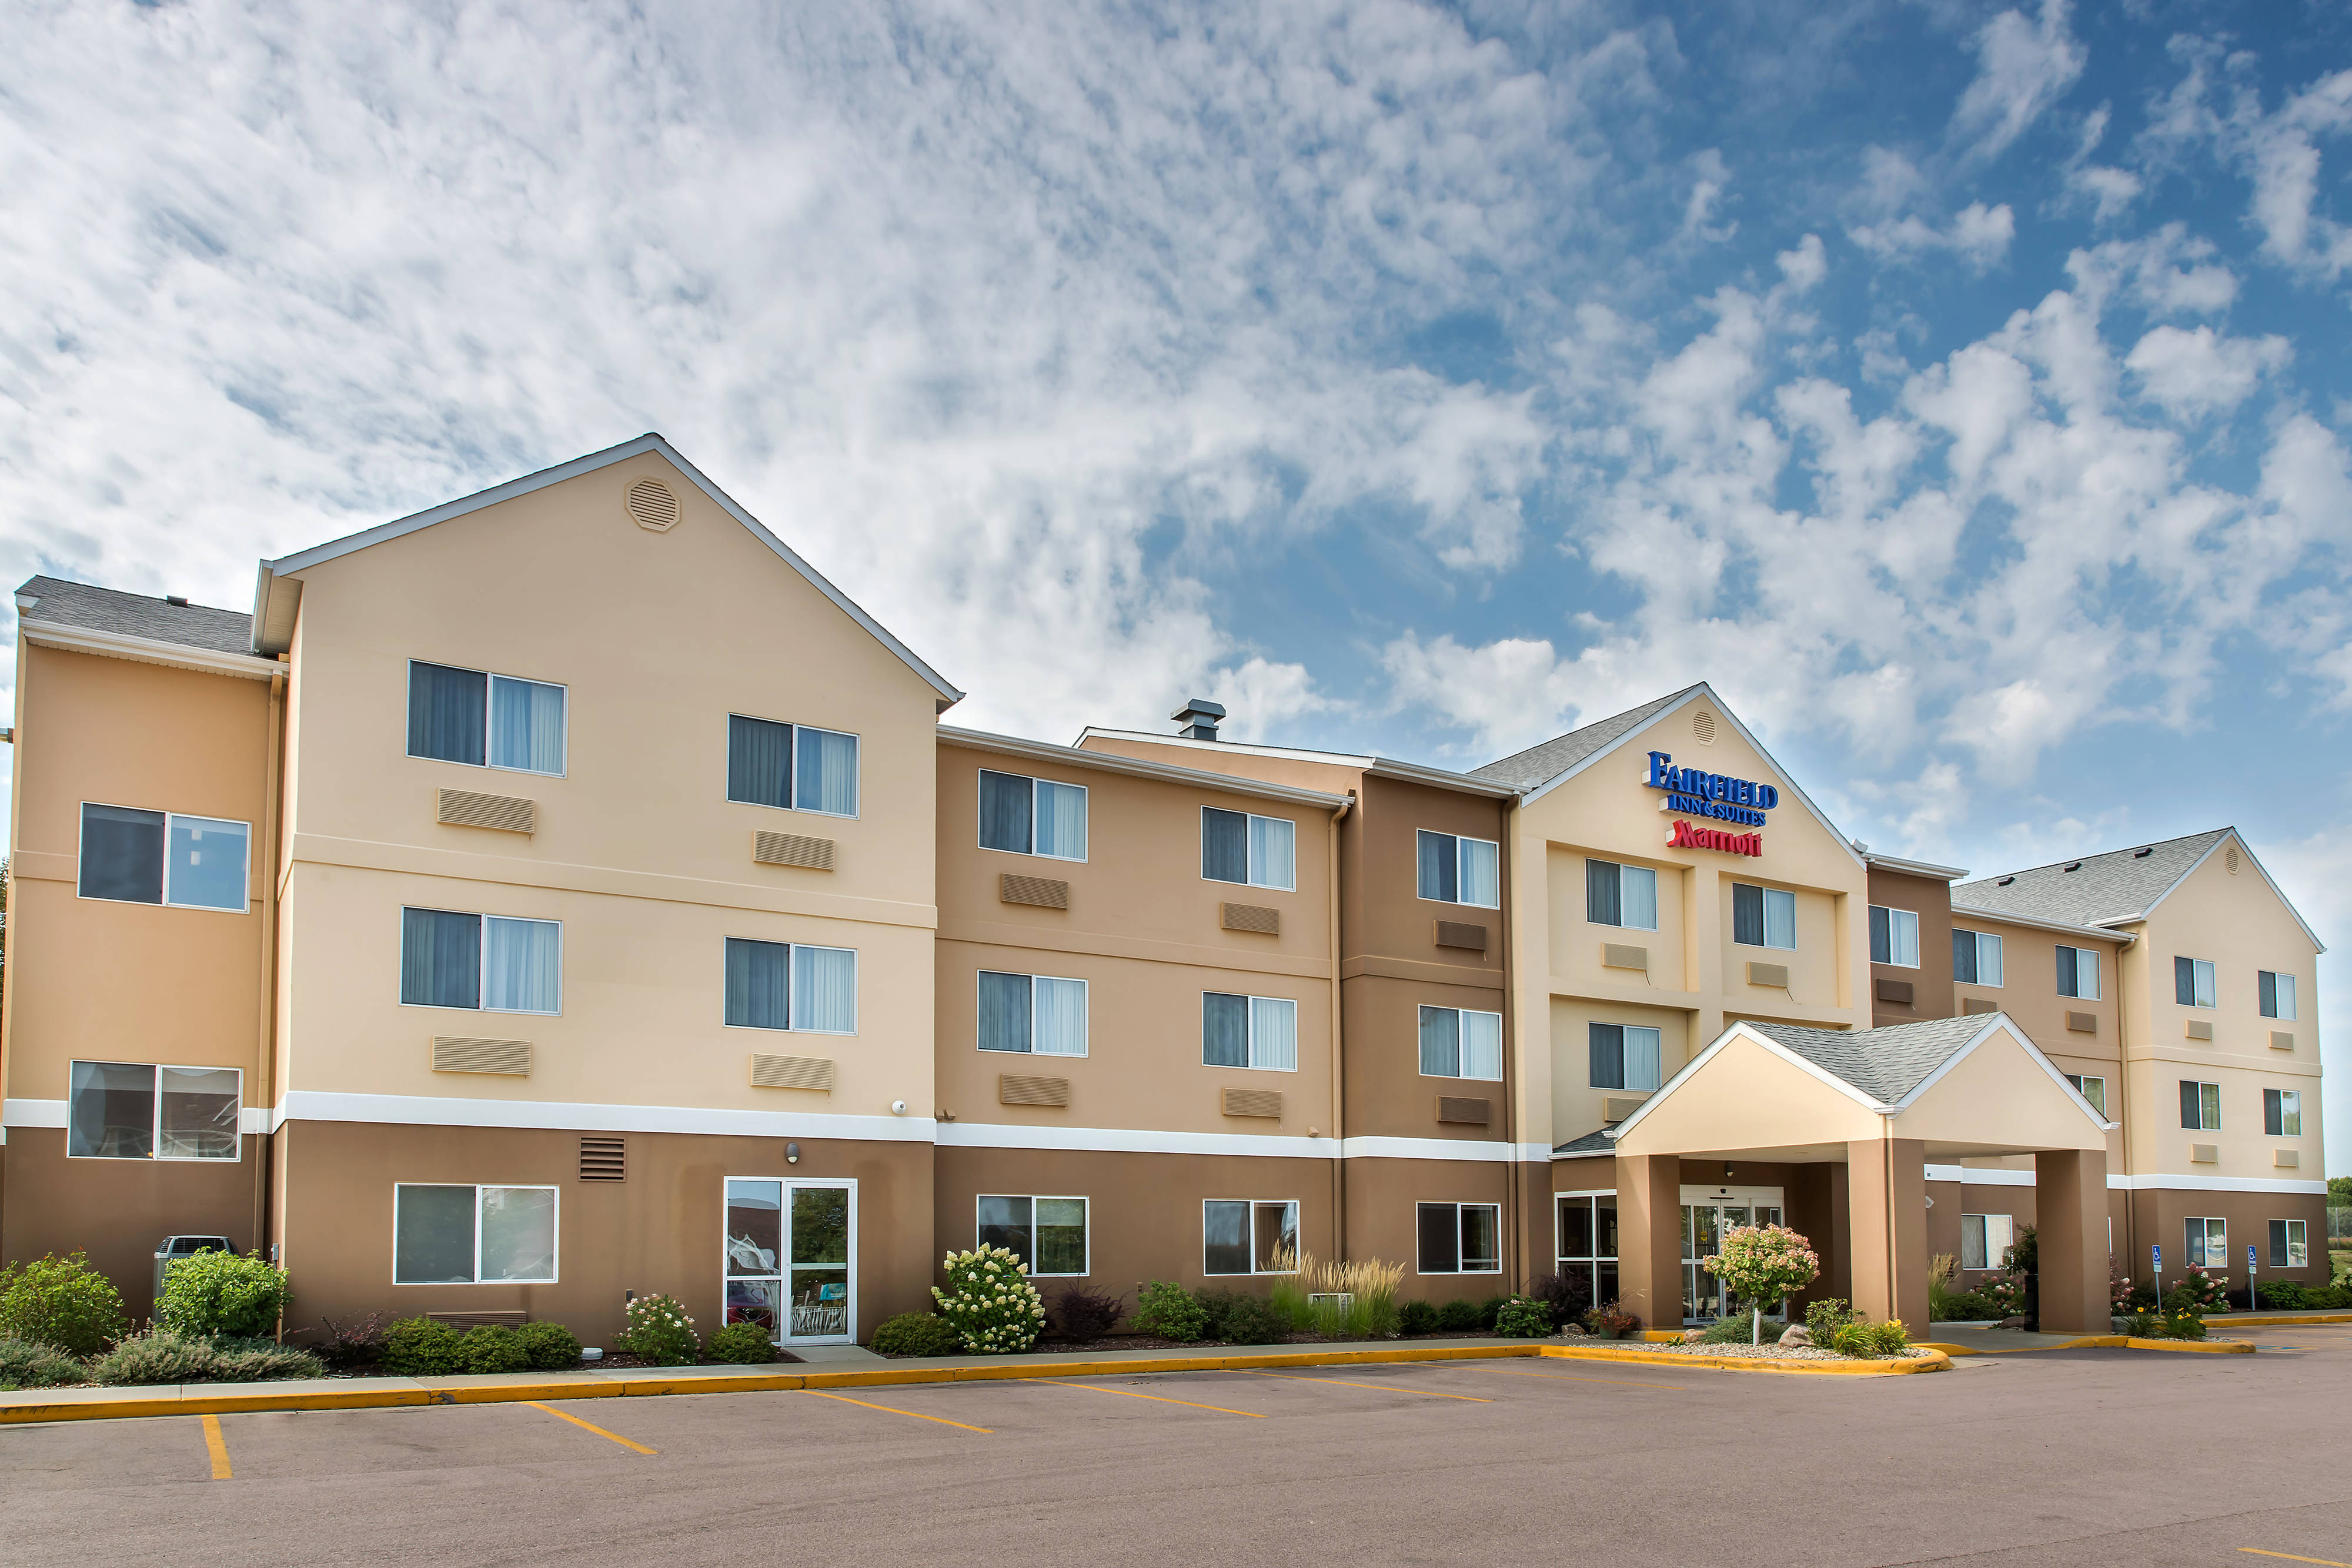 Fairfield Inn & Suites By Marriott Sioux Falls